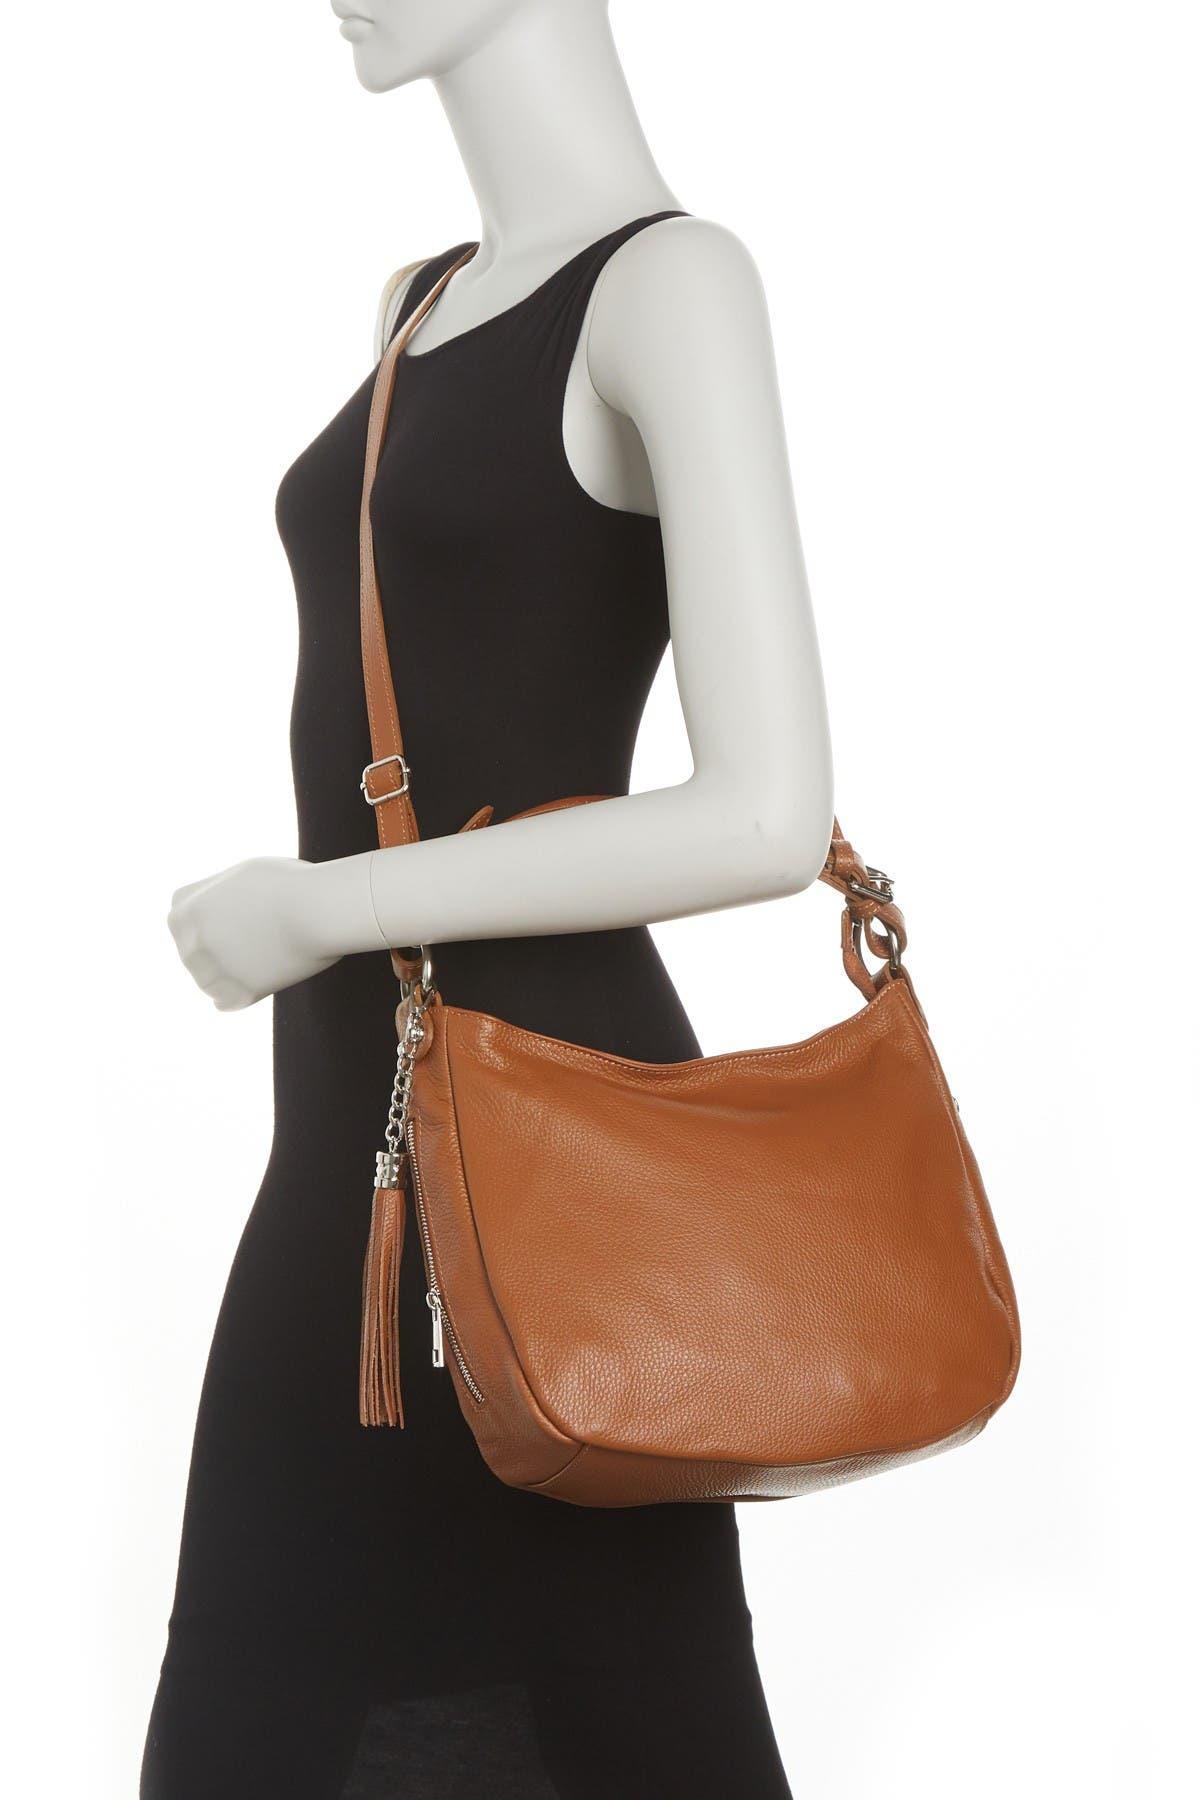 Image of Massimo Castelli Top Handle Leather Crossbody Bag